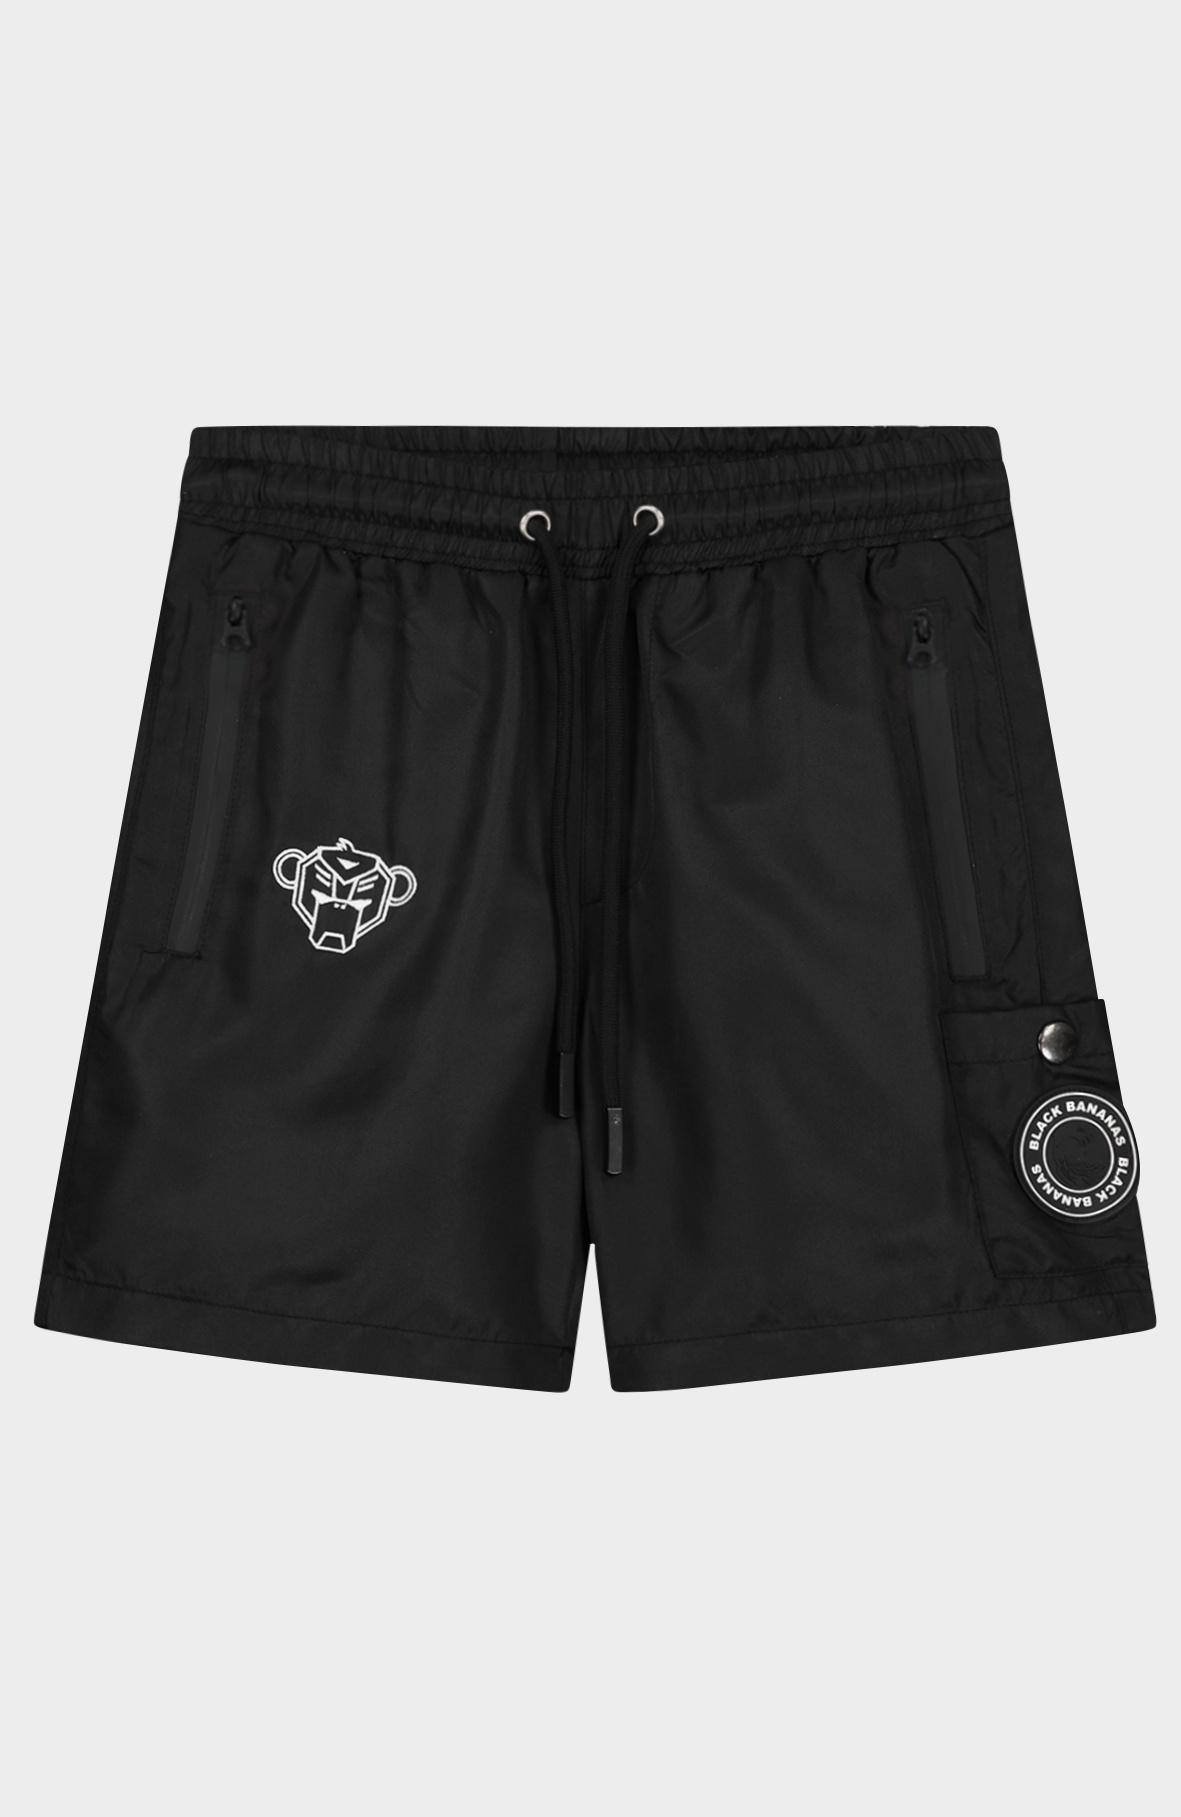 Jr. Pocket Swimshort Black-1